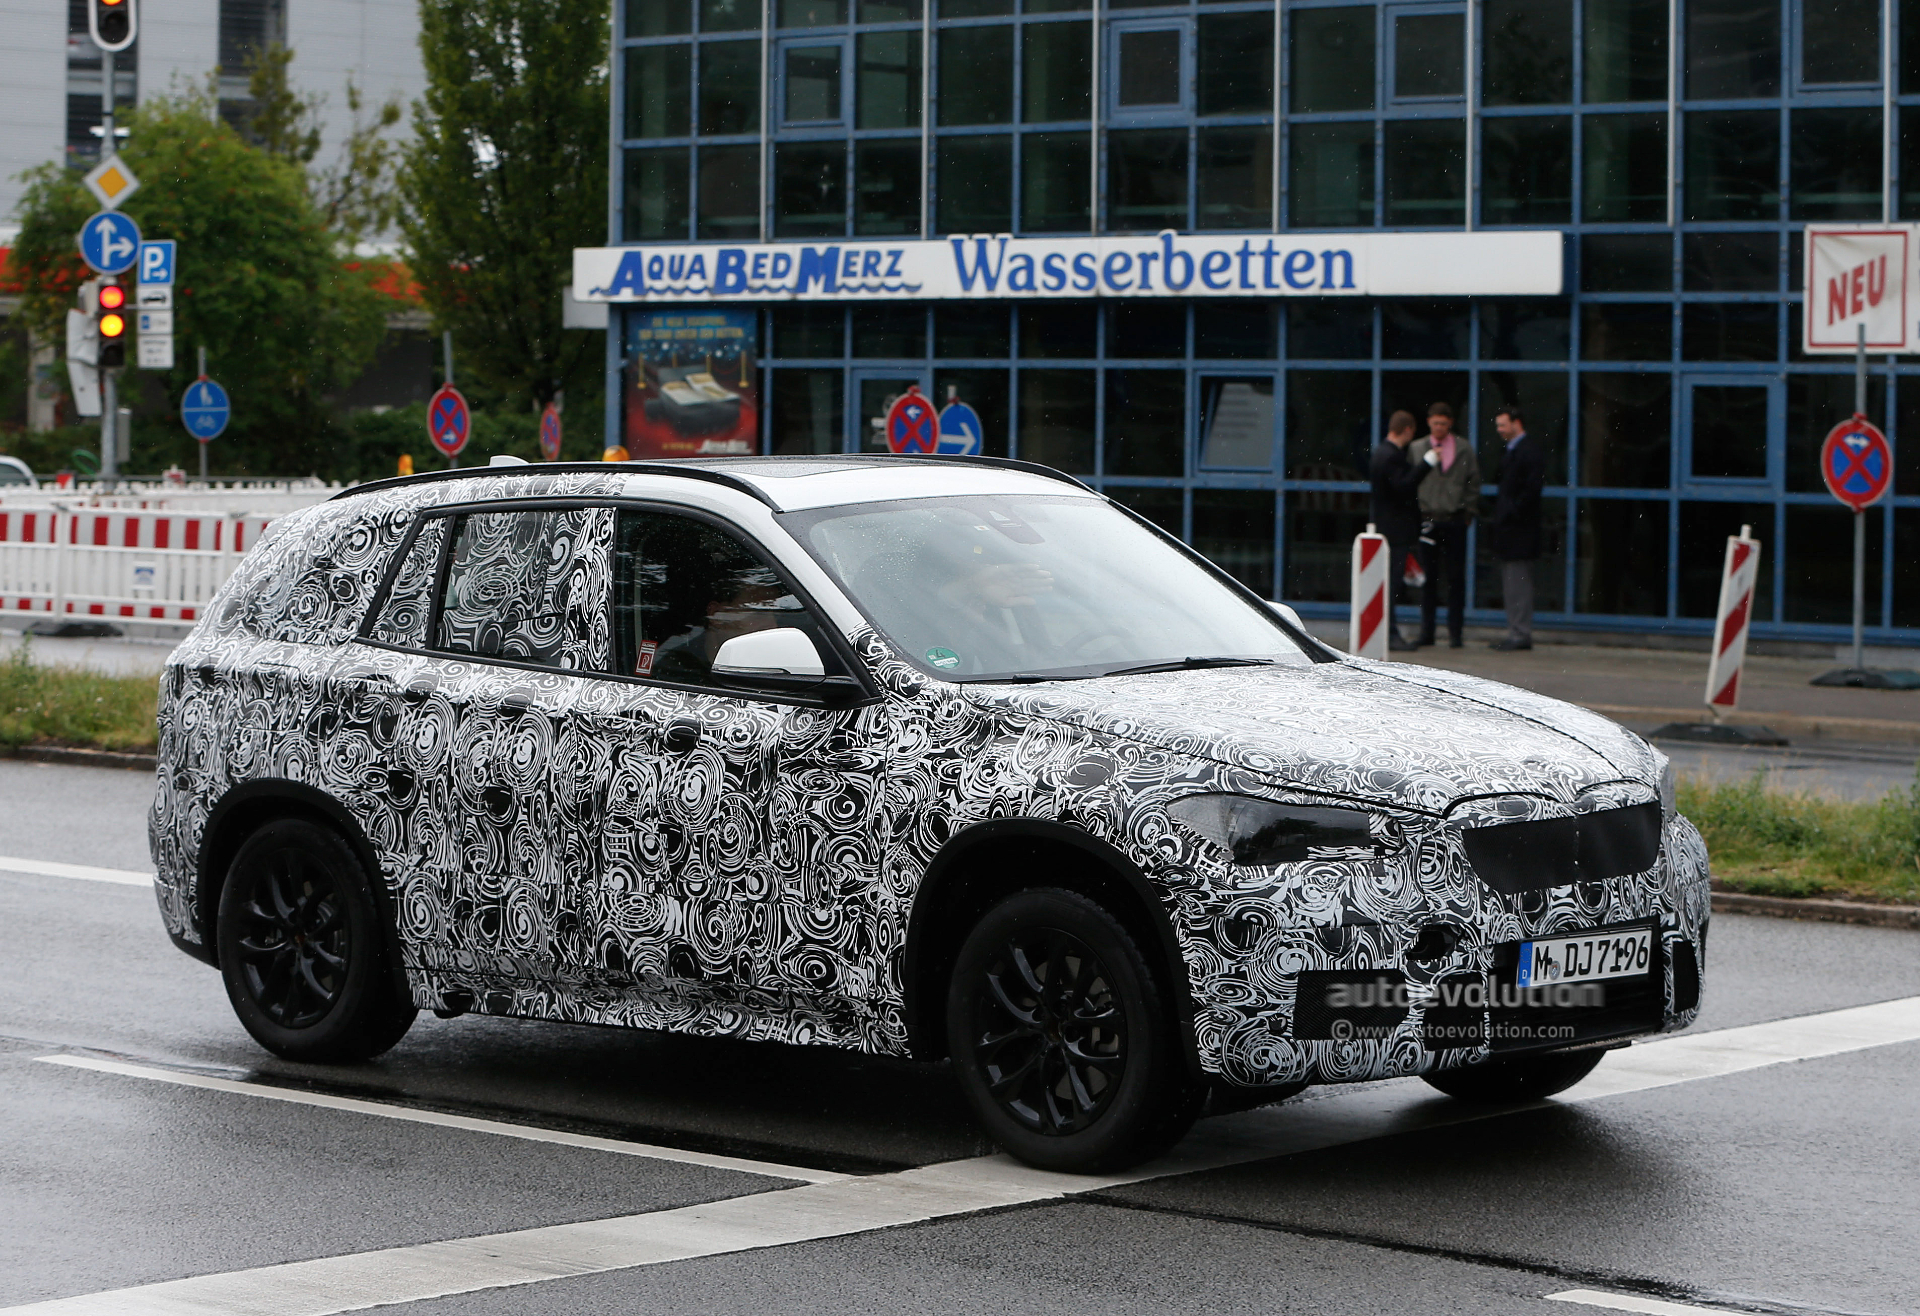 2015 - [BMW] X1 II [F48] - Page 5 2016-bmw-x1-spied-wearing-production-headlights-photo-gallery_2